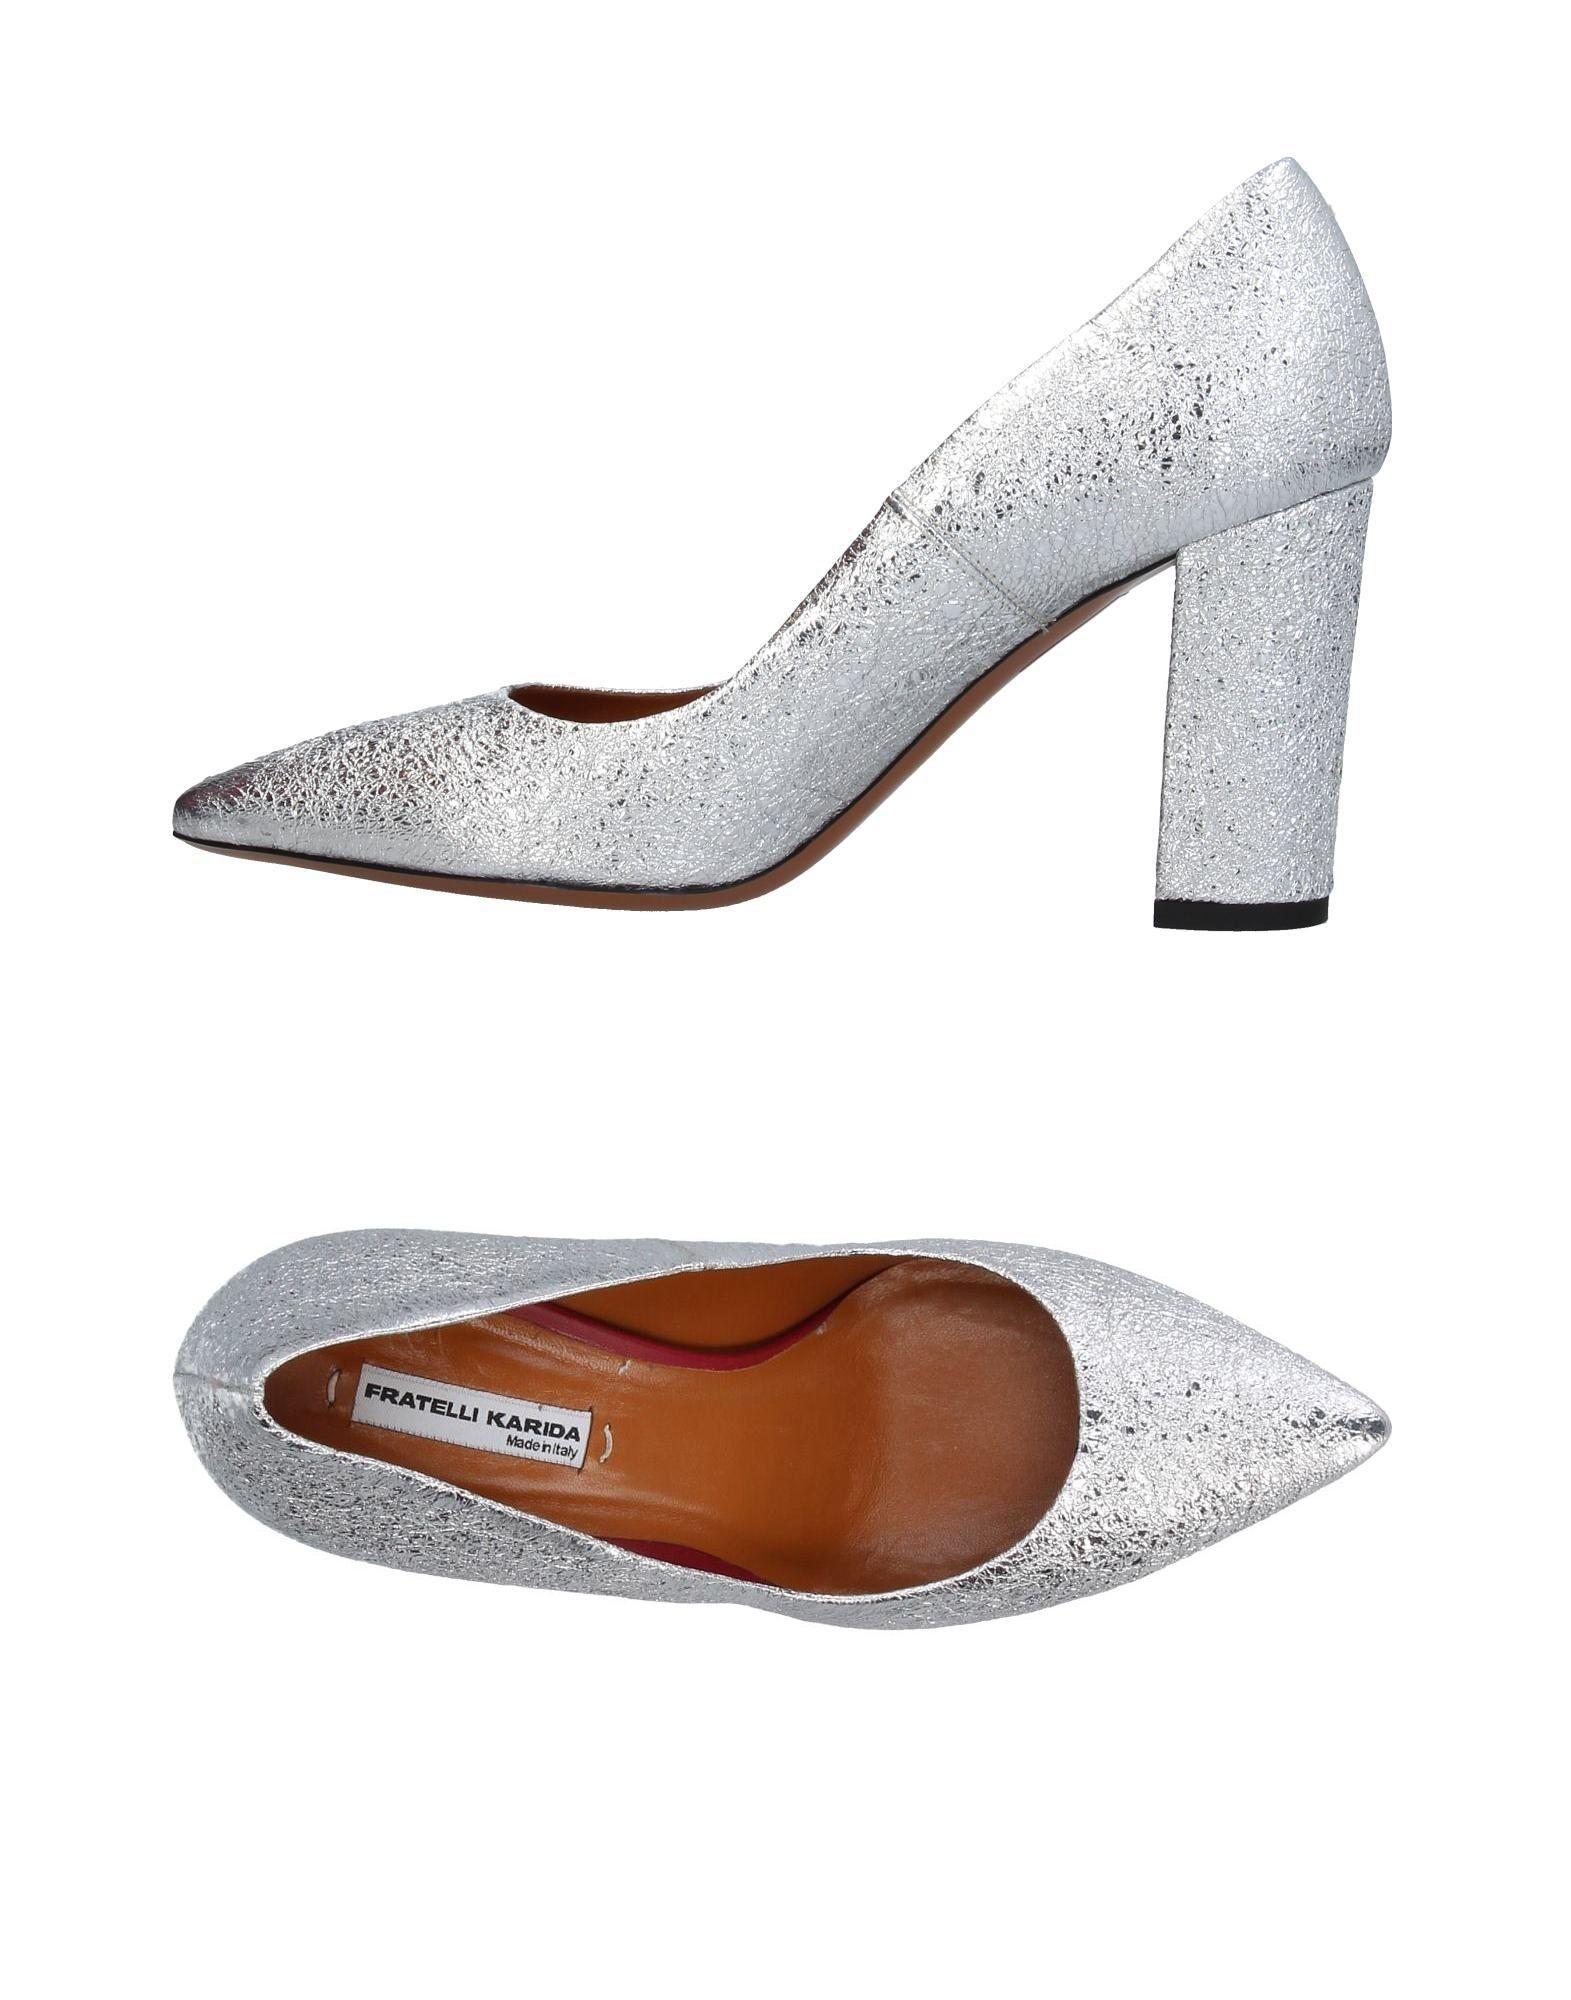 Fratelli Karida Pumps Damen  11400736FV Gute Qualität beliebte Schuhe